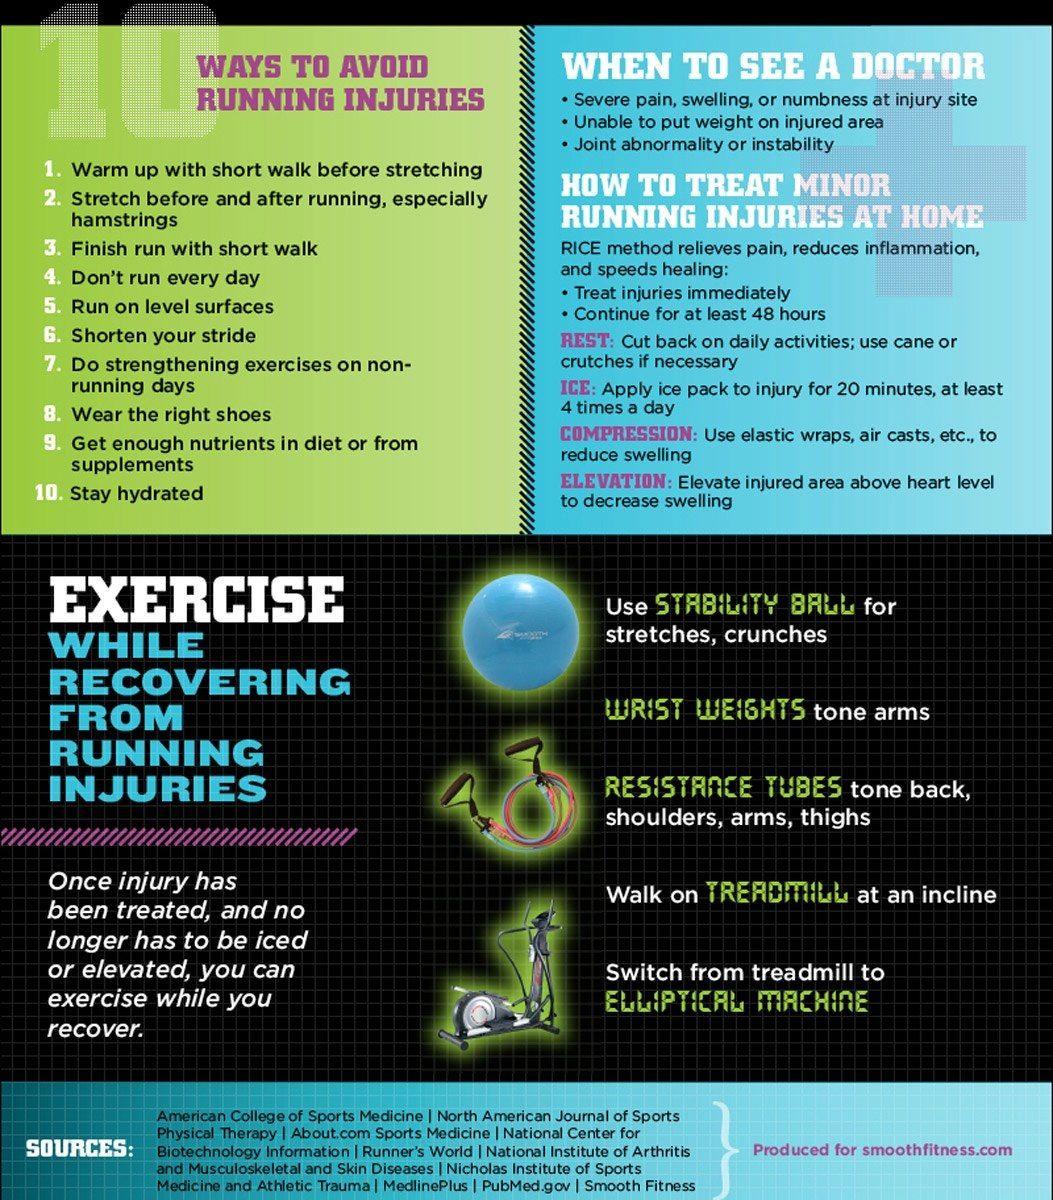 Ways to avoid running injuries